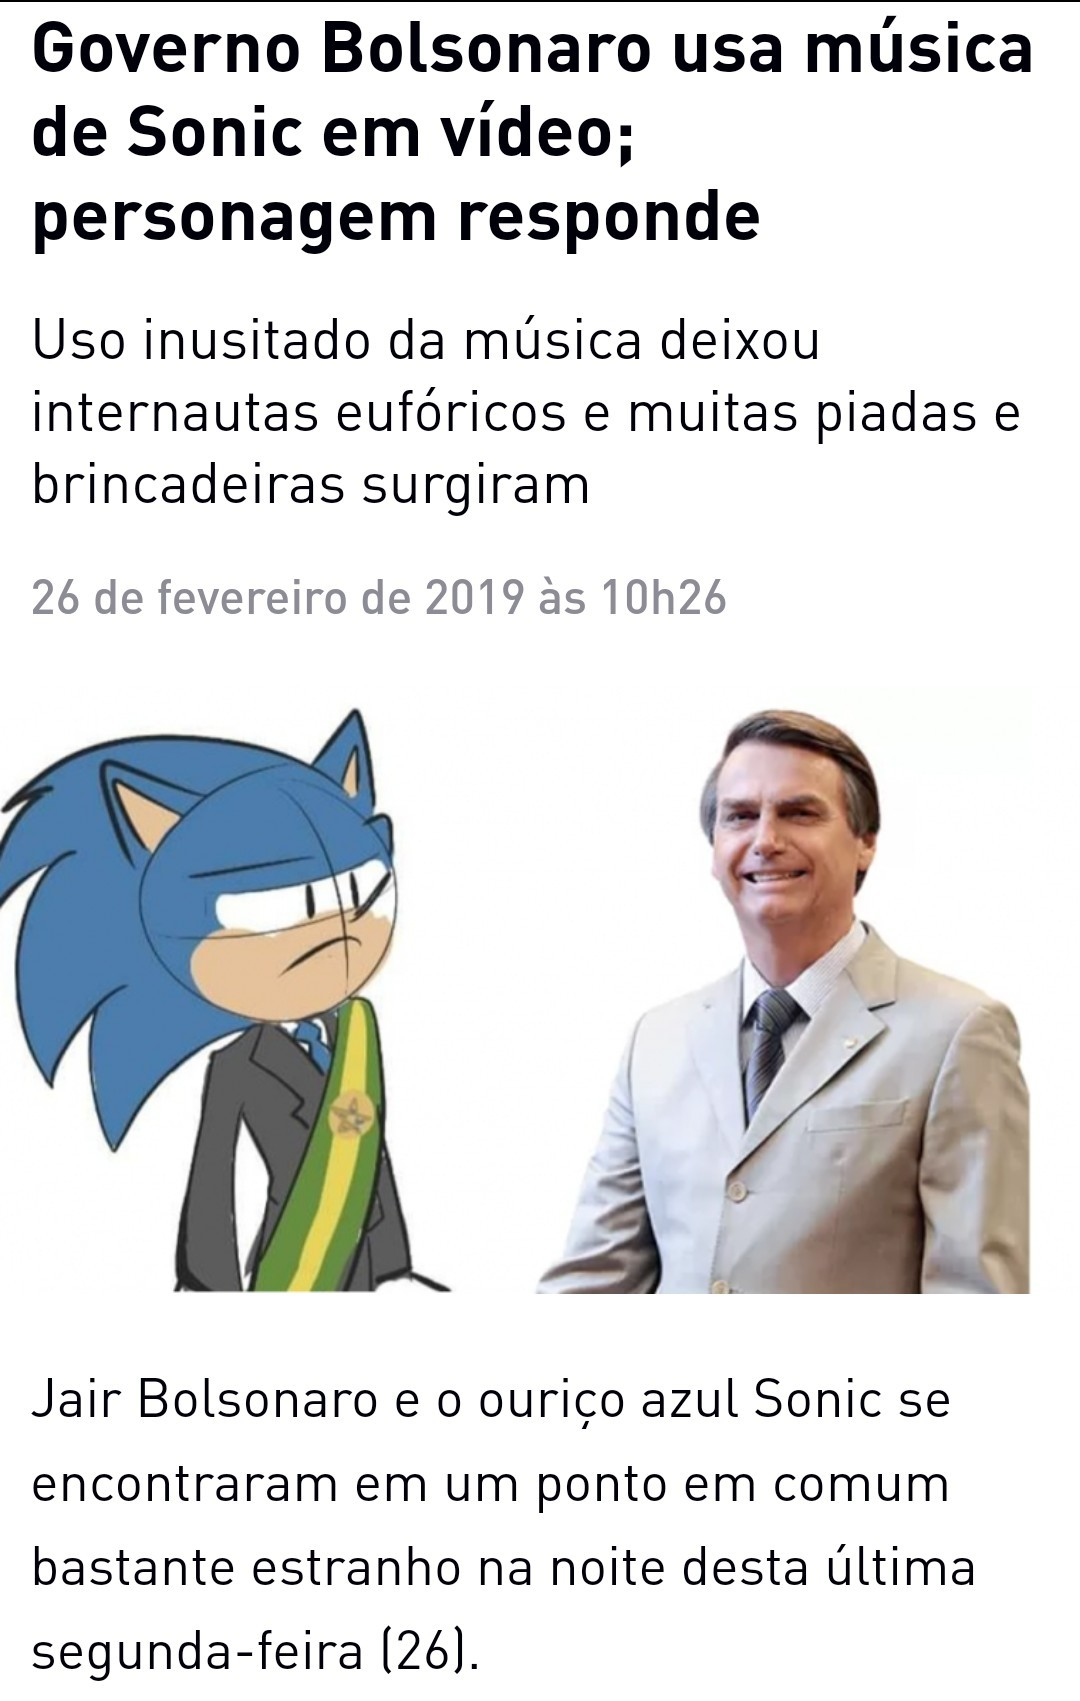 Bolsosonic - meme